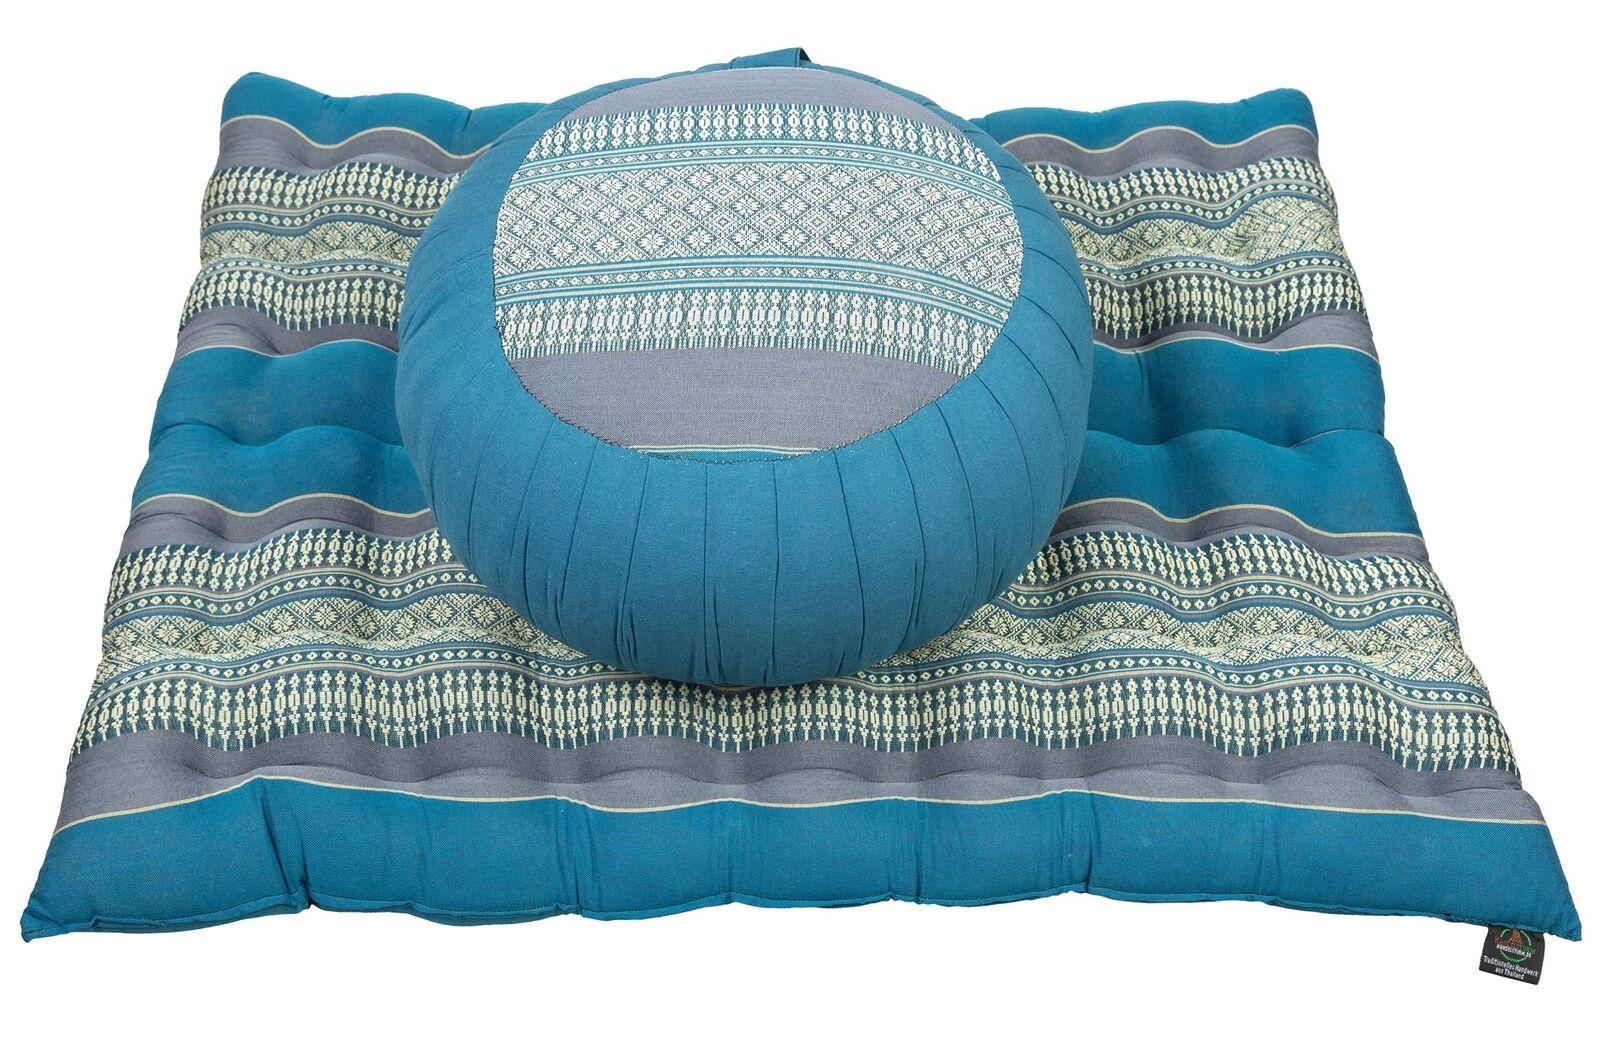 Zafu round Pillow + Zabuton Mat Meditation Seat Set Set Set Natural Kapok Filling Firm Z 6afa67